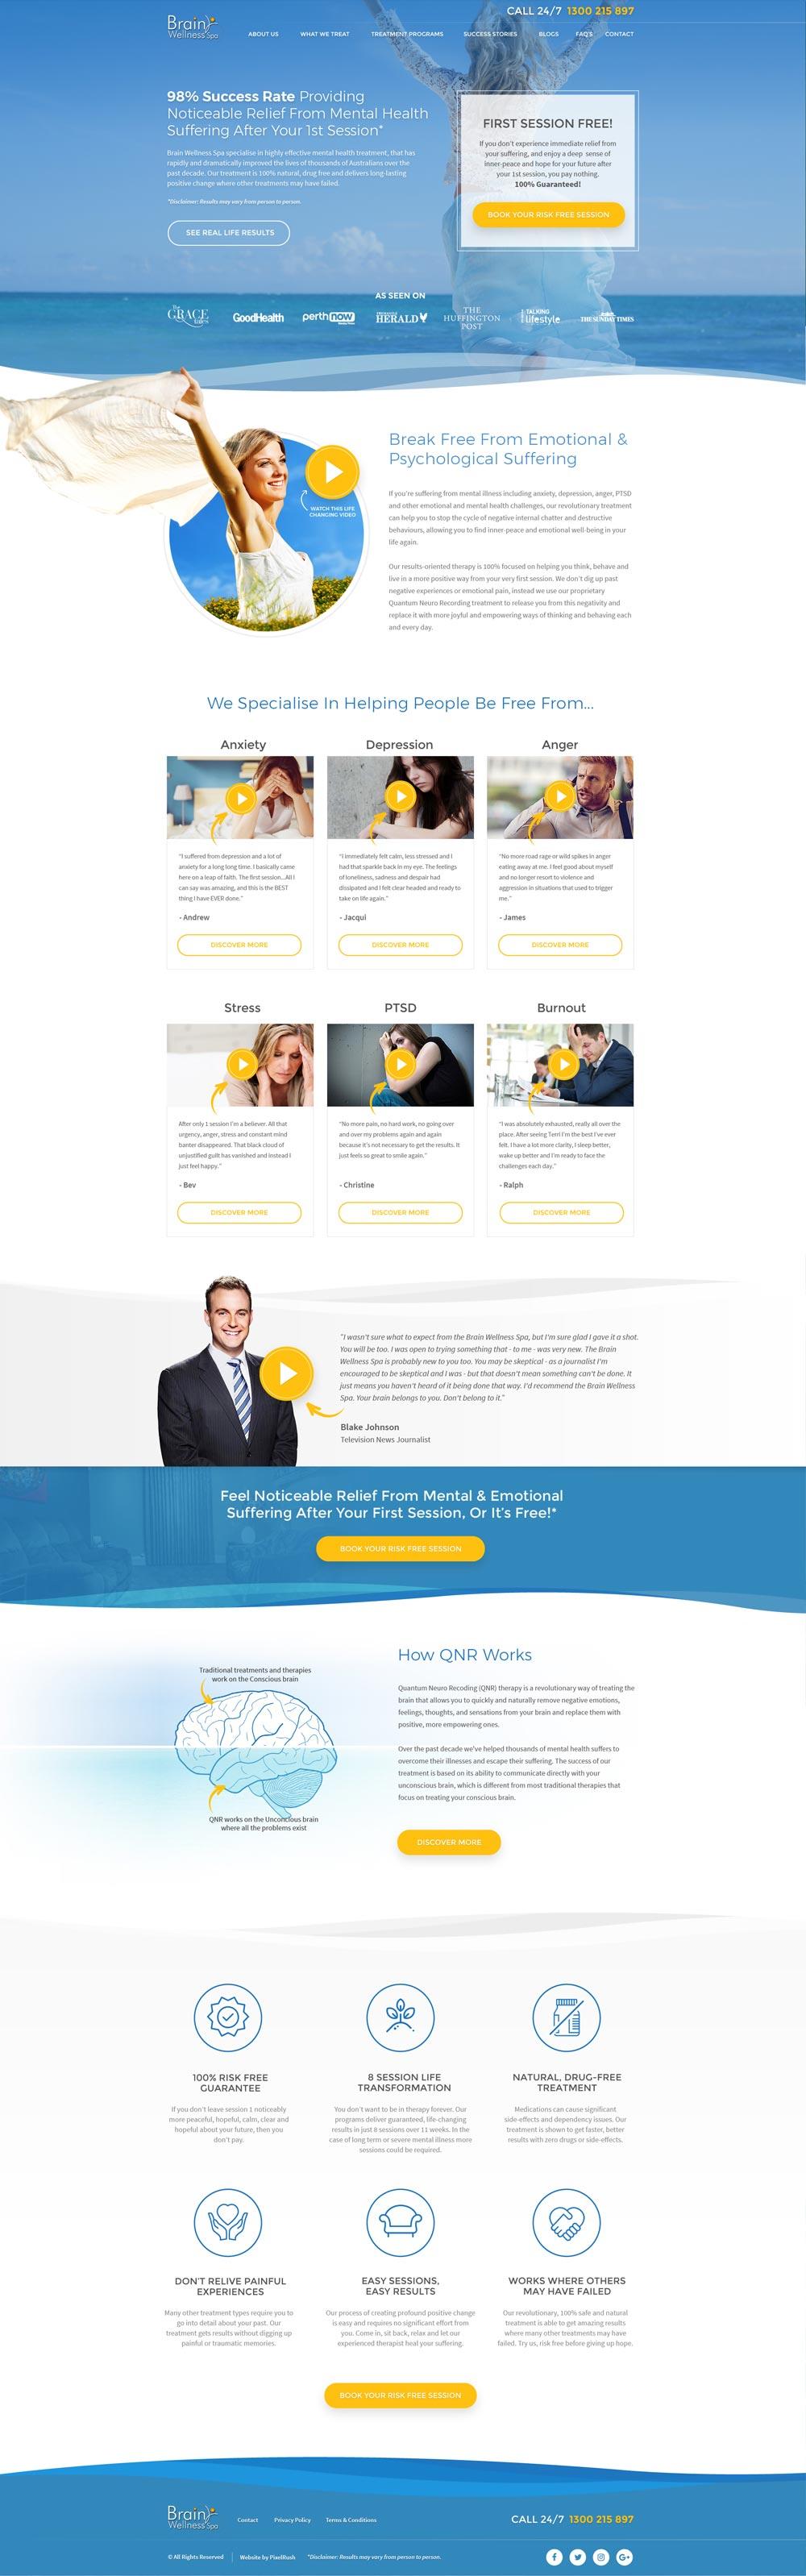 Brain Wellness Spa Web Design